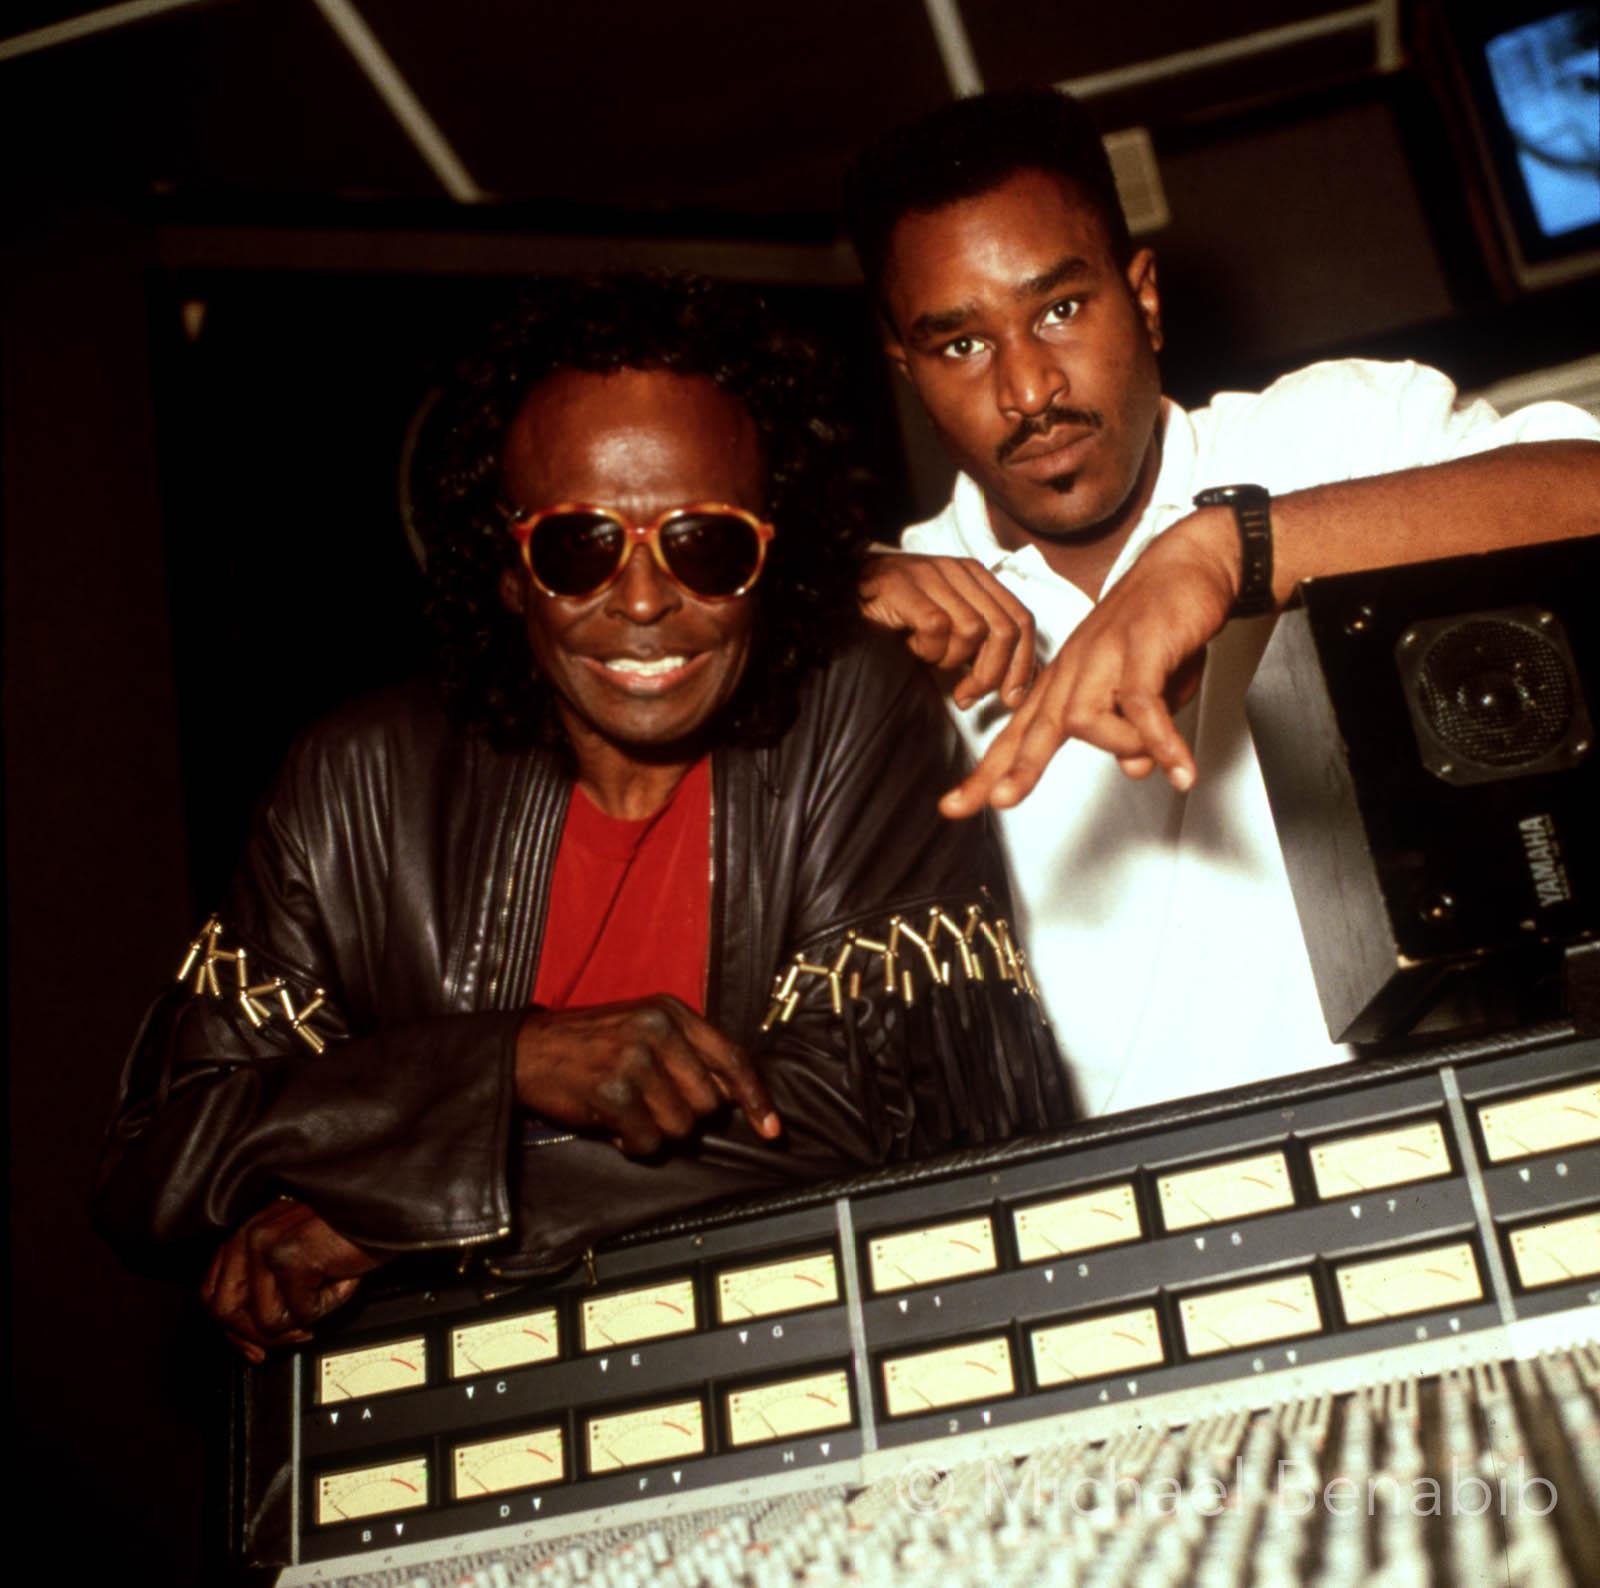 Miles Davis and Easy Mo Bee